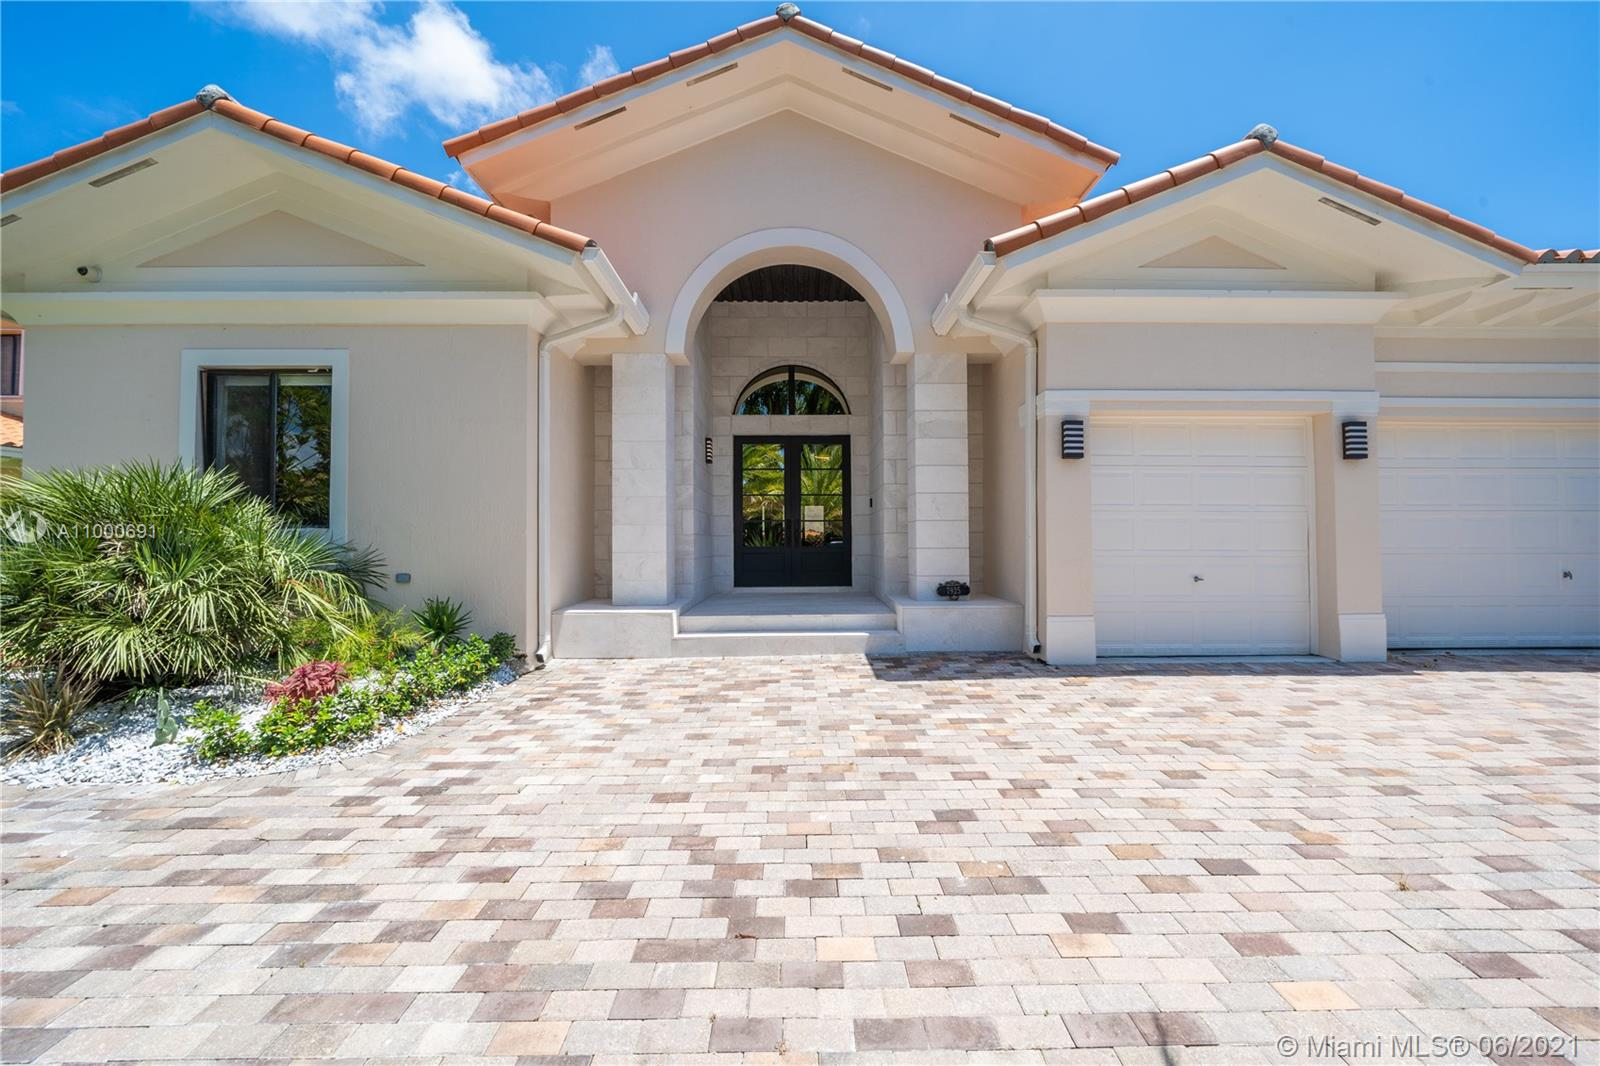 7925 193rd St, Cutler Bay, Florida 33157